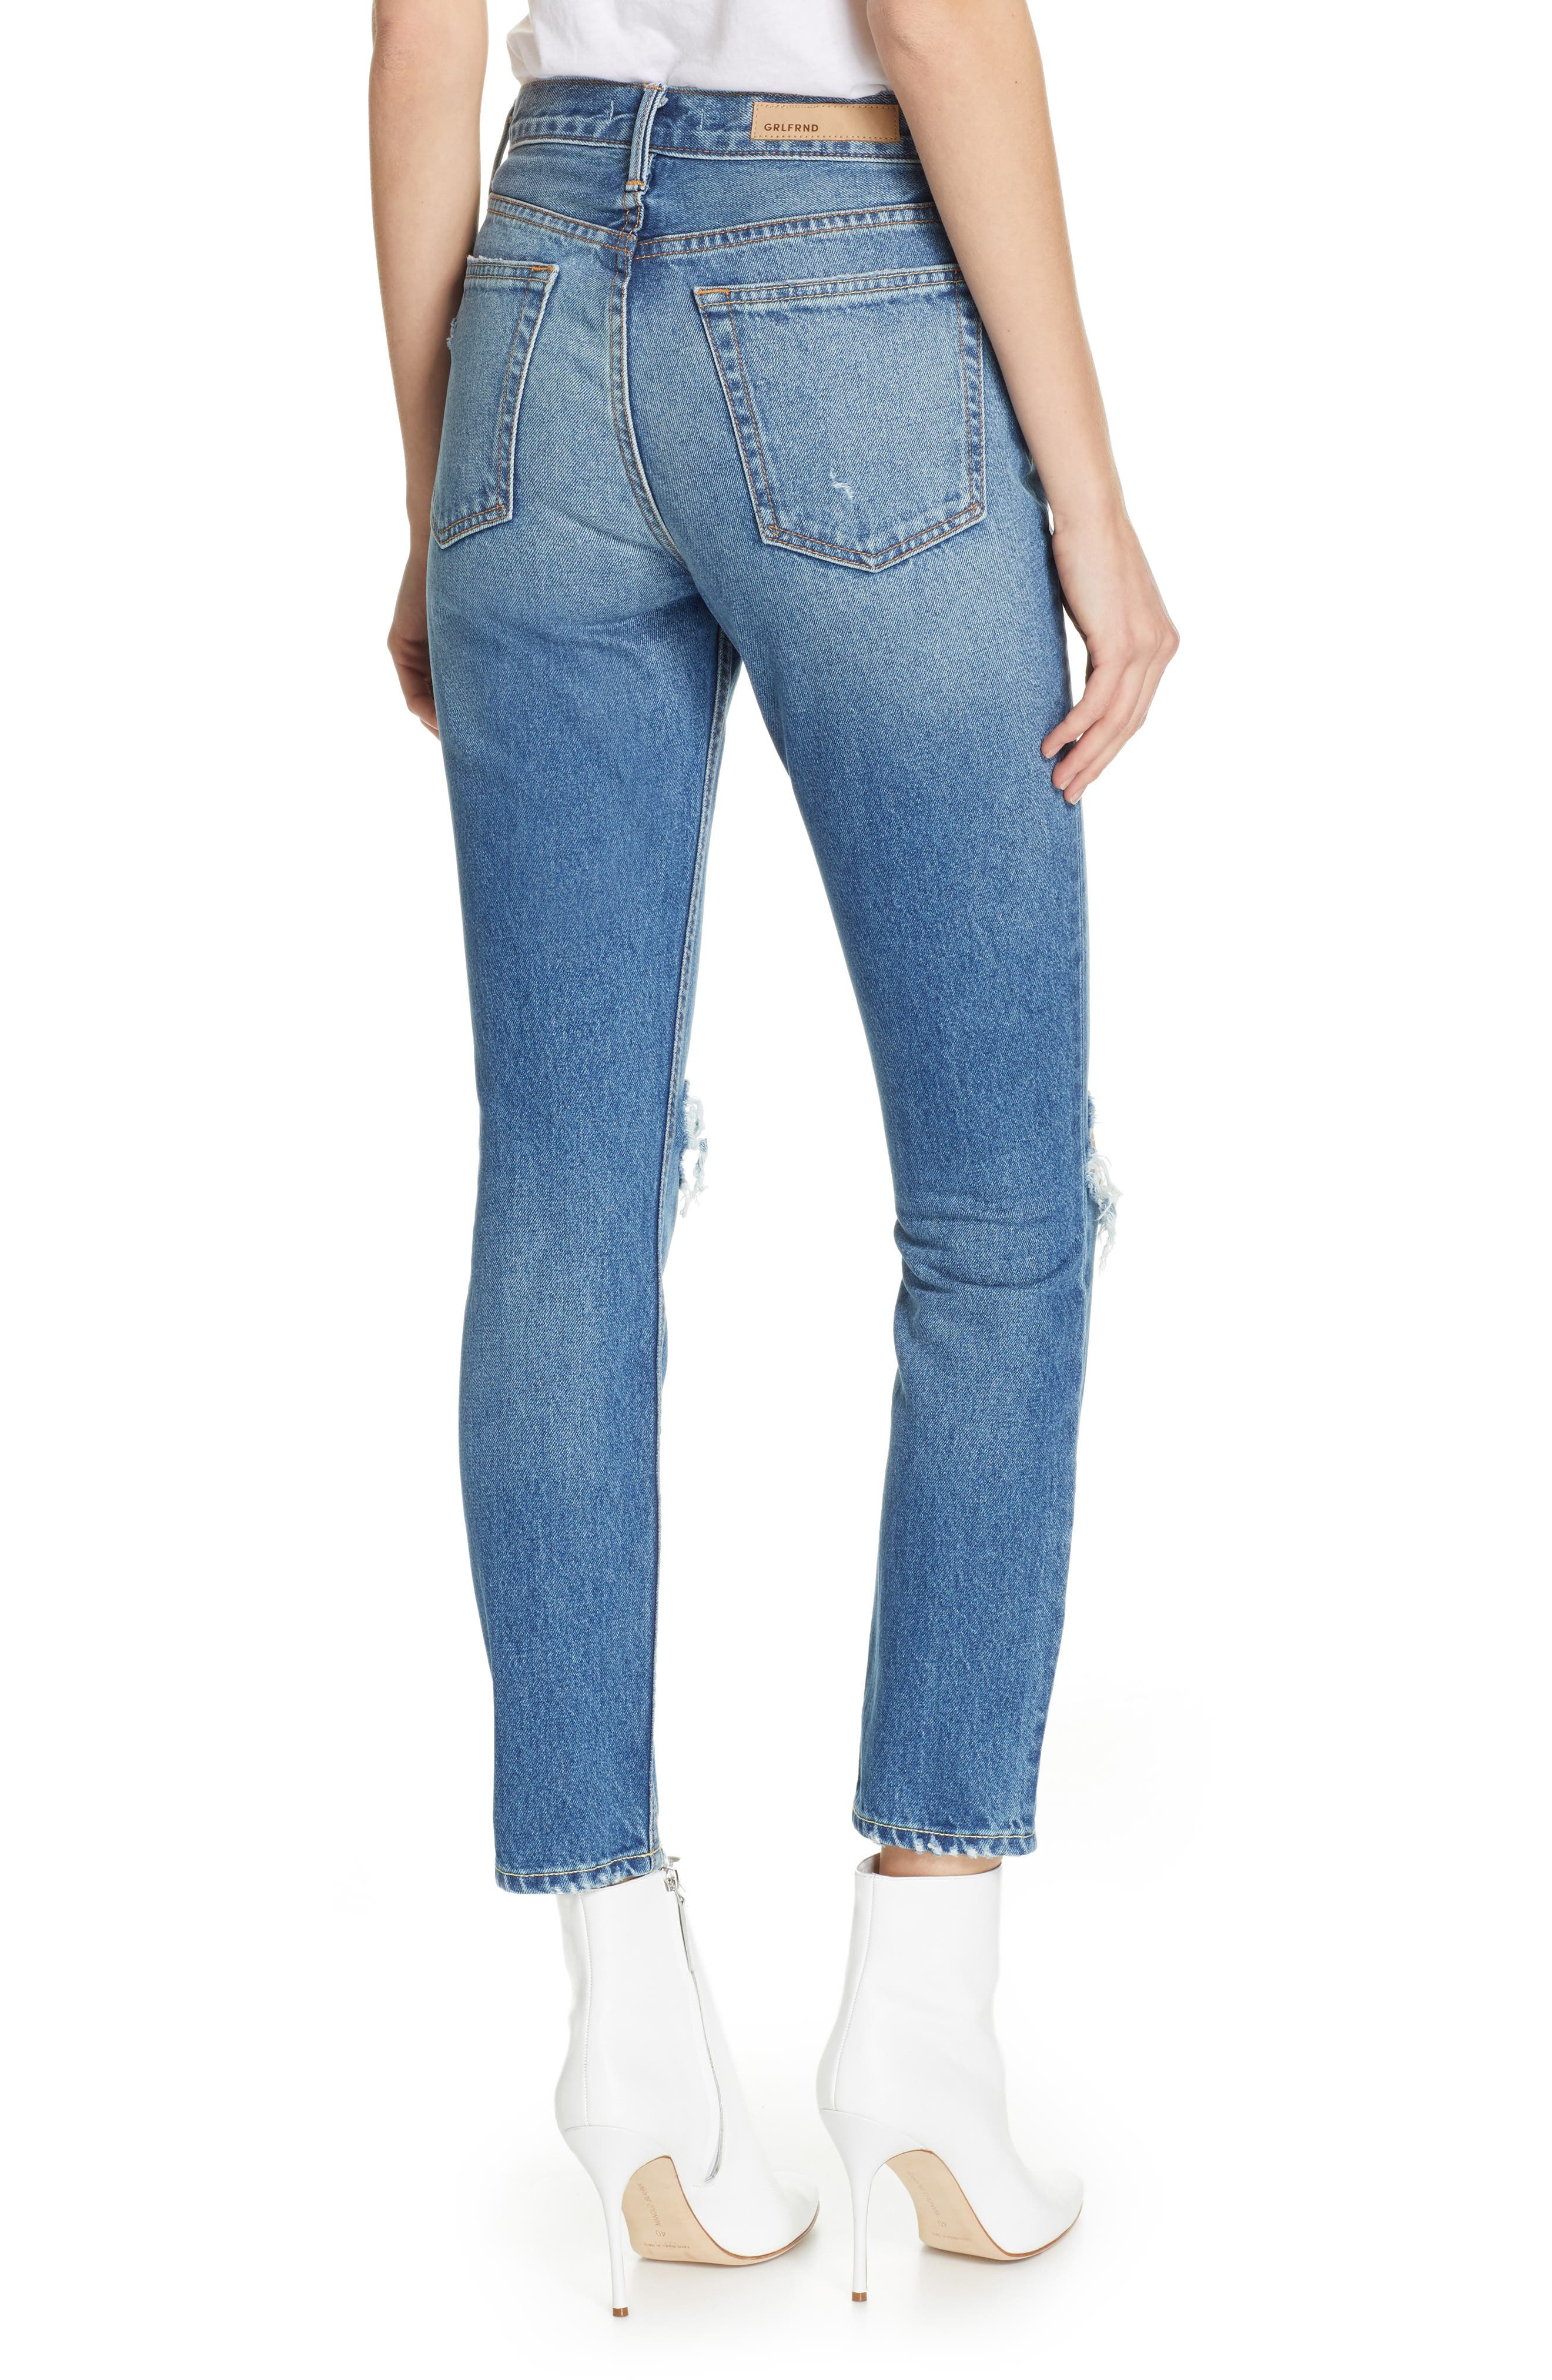 GRLFRND,                             Karolina Ripped High Waist Skinny Jeans,                             Alternate thumbnail 2, color,                             I PUT A SPELL ON YOU